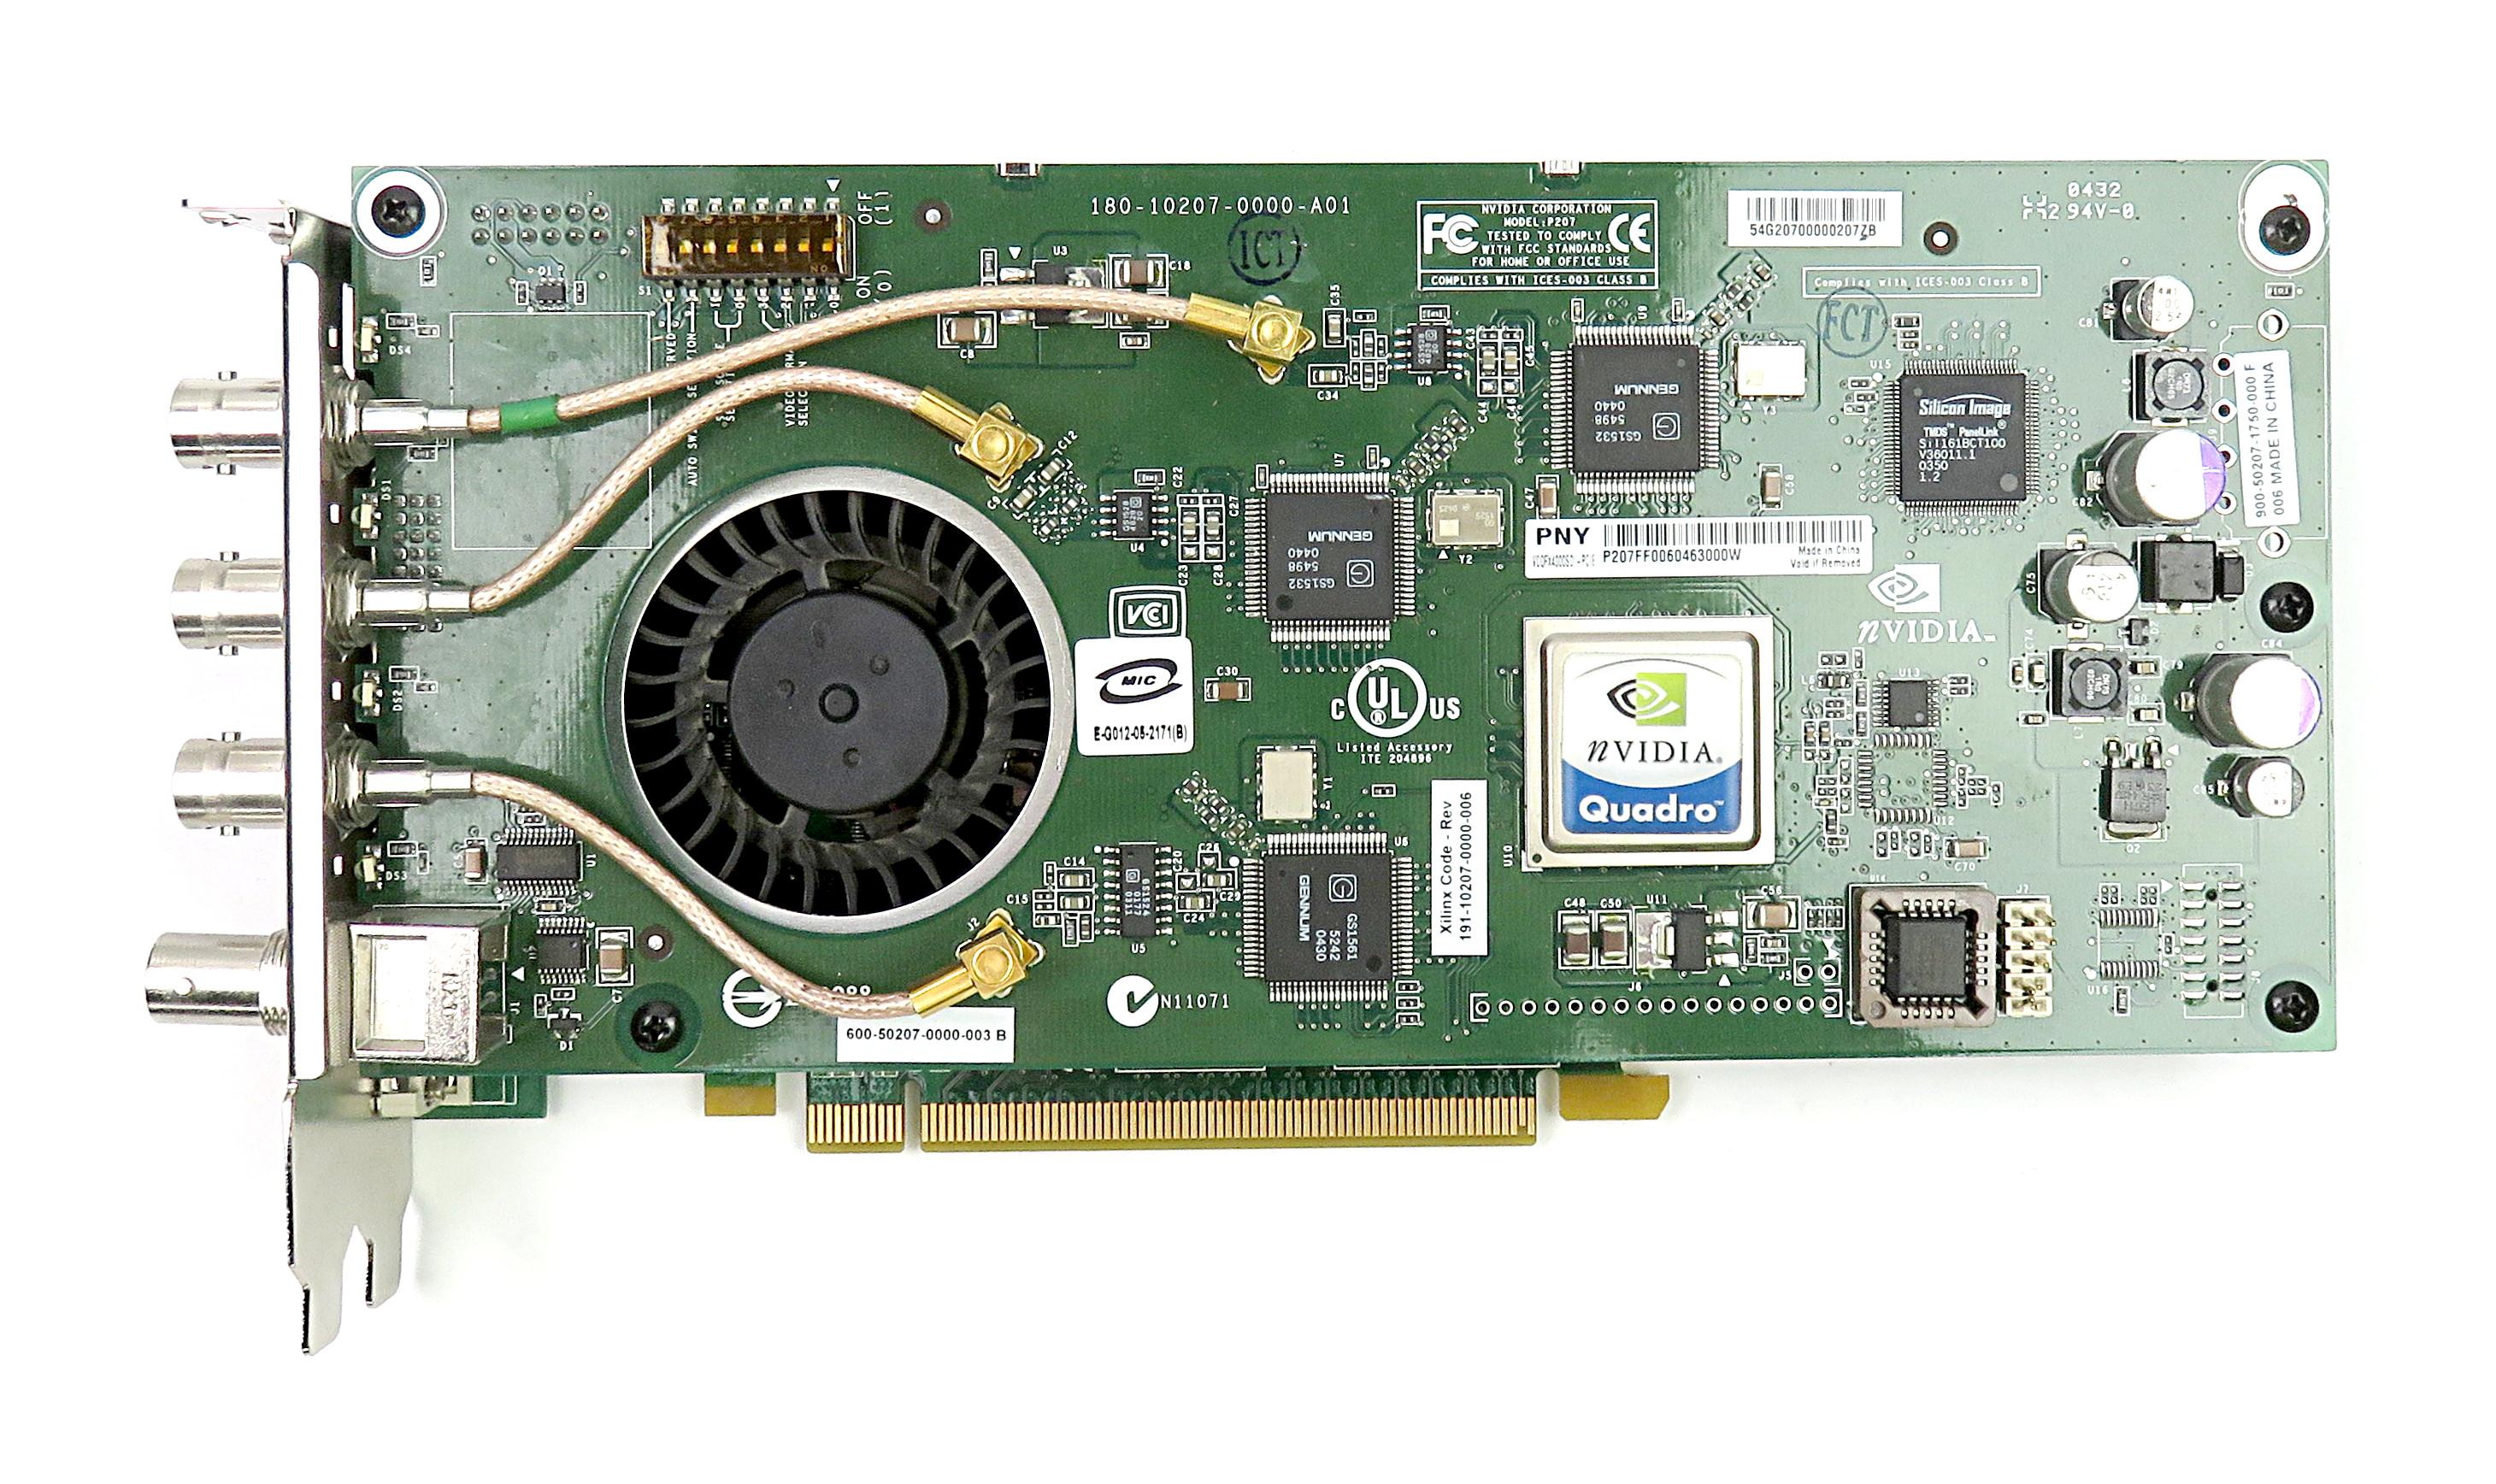 Pny nVidia Quadro FX3540/4000 256MB GDDR3 Video Card VCQFX4000SDI-PCIE DVI/4xBNC